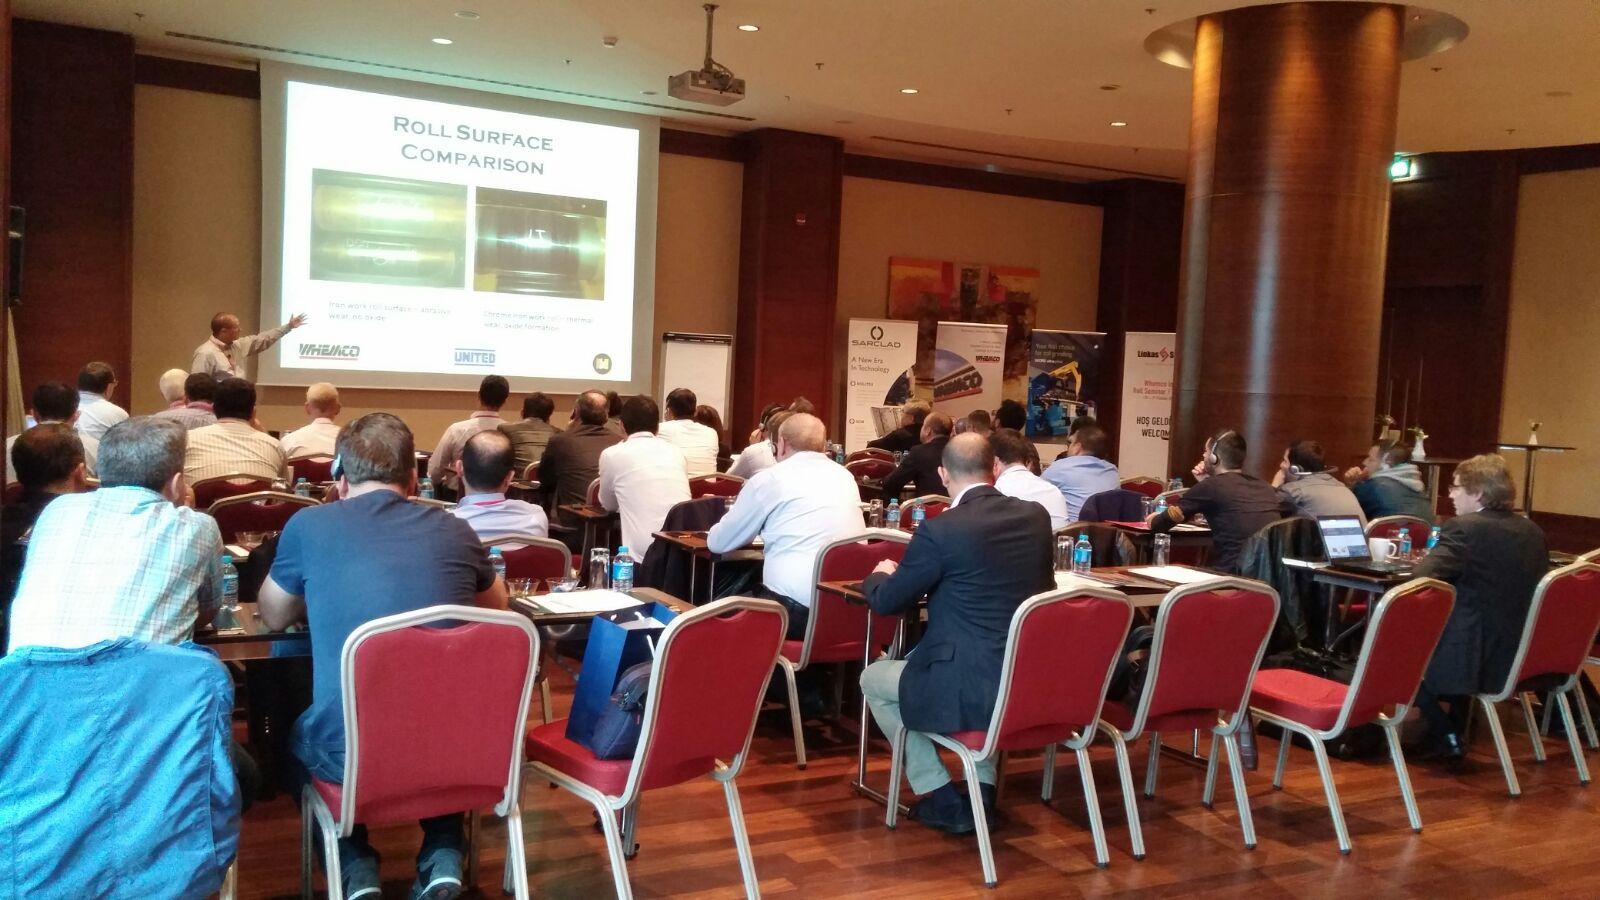 Sarclad Attend the 2015 Whemco Roll Seminar in Turkey